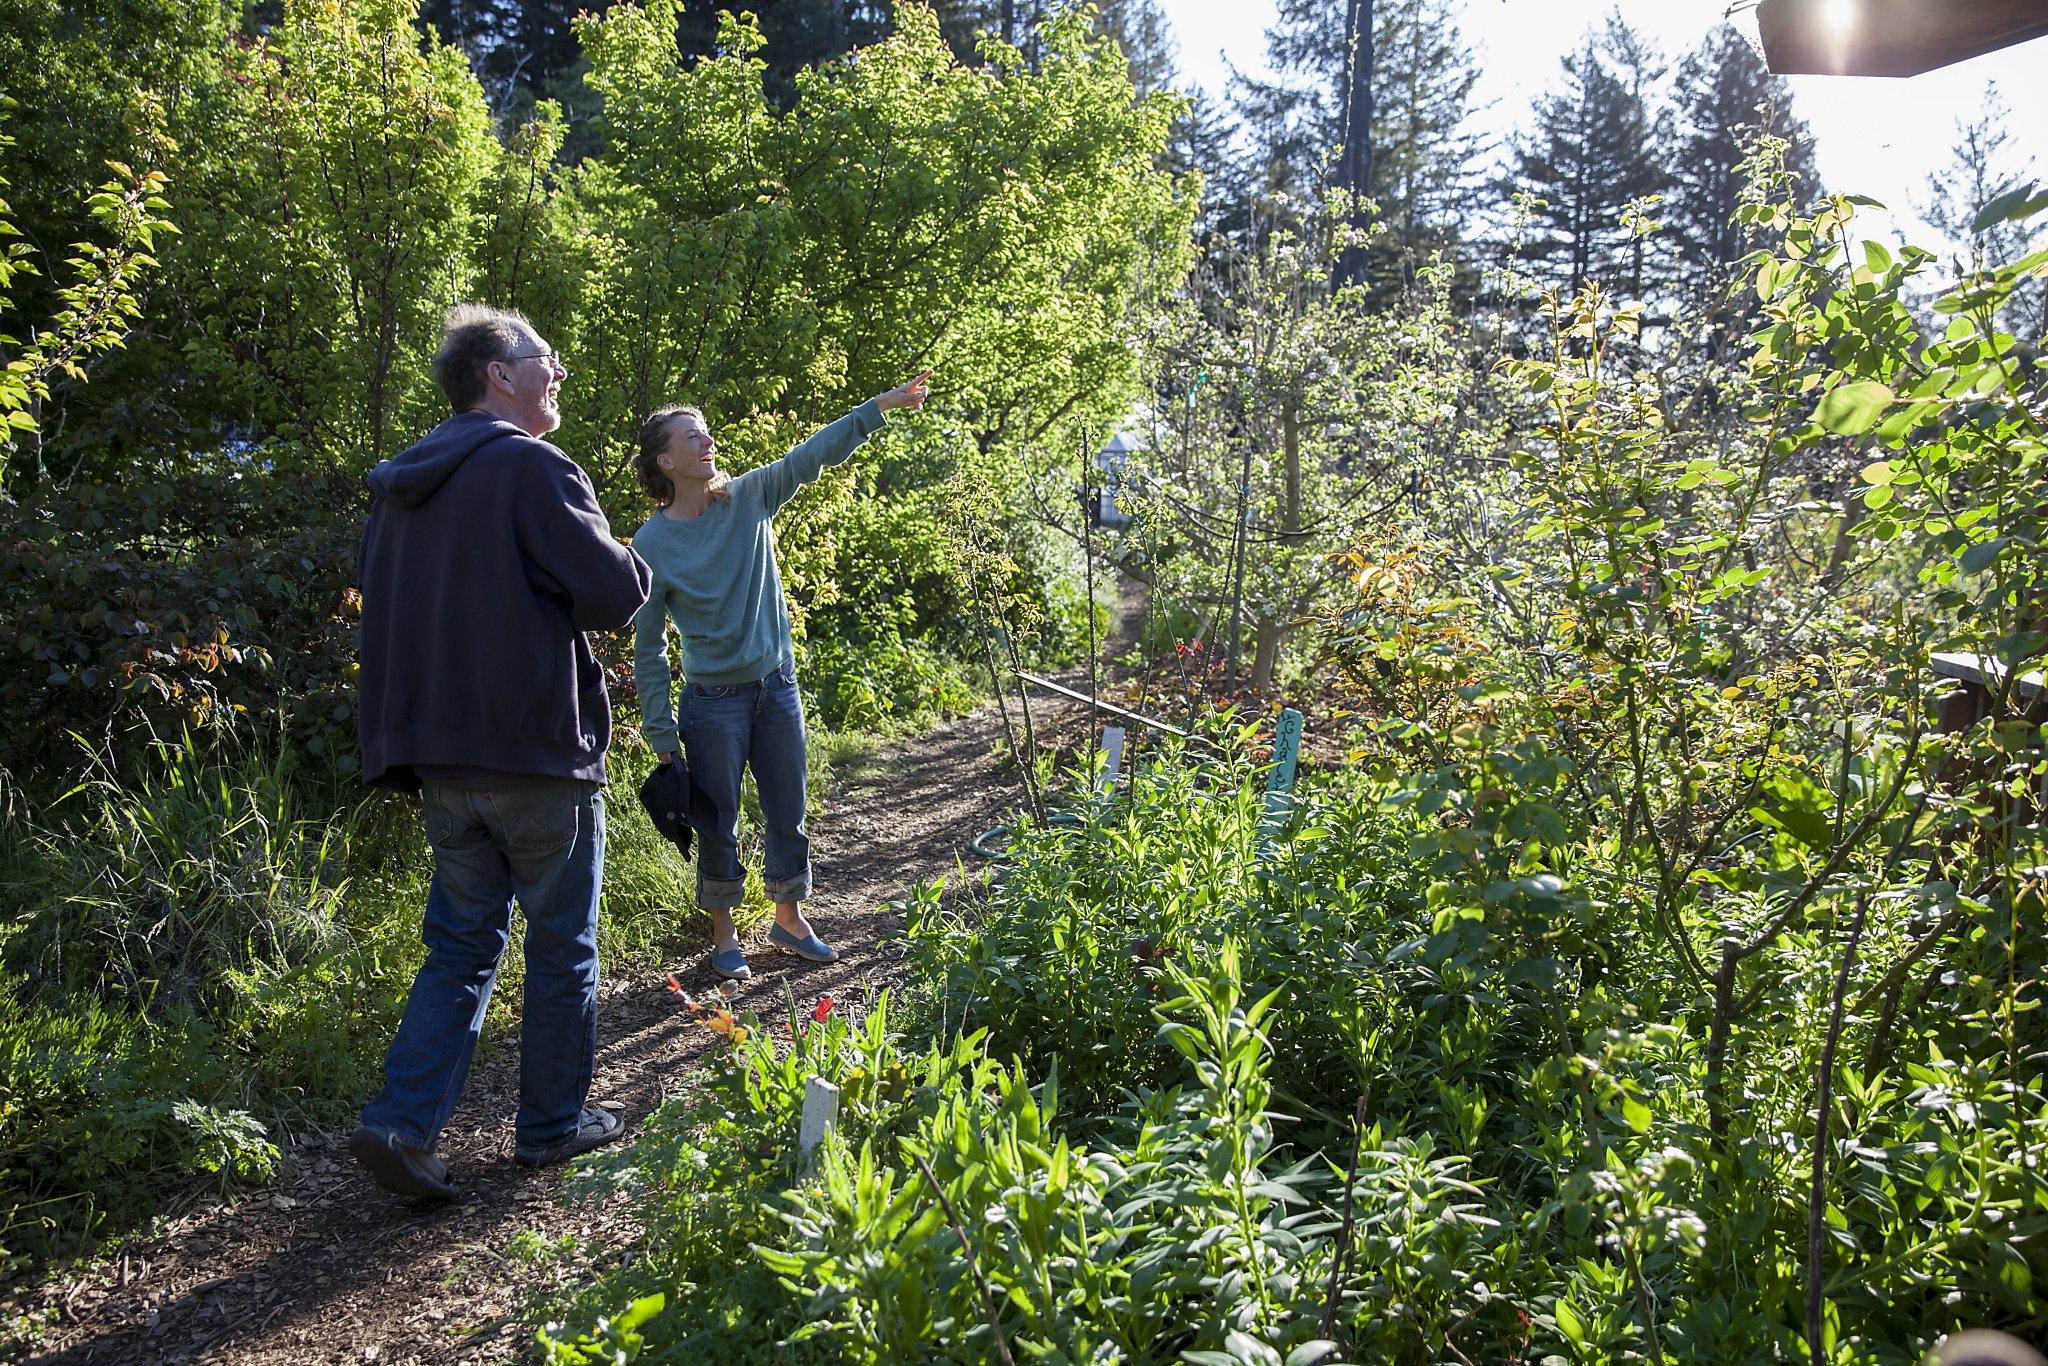 The Santa Cruz garden that launched a movement - SFGate